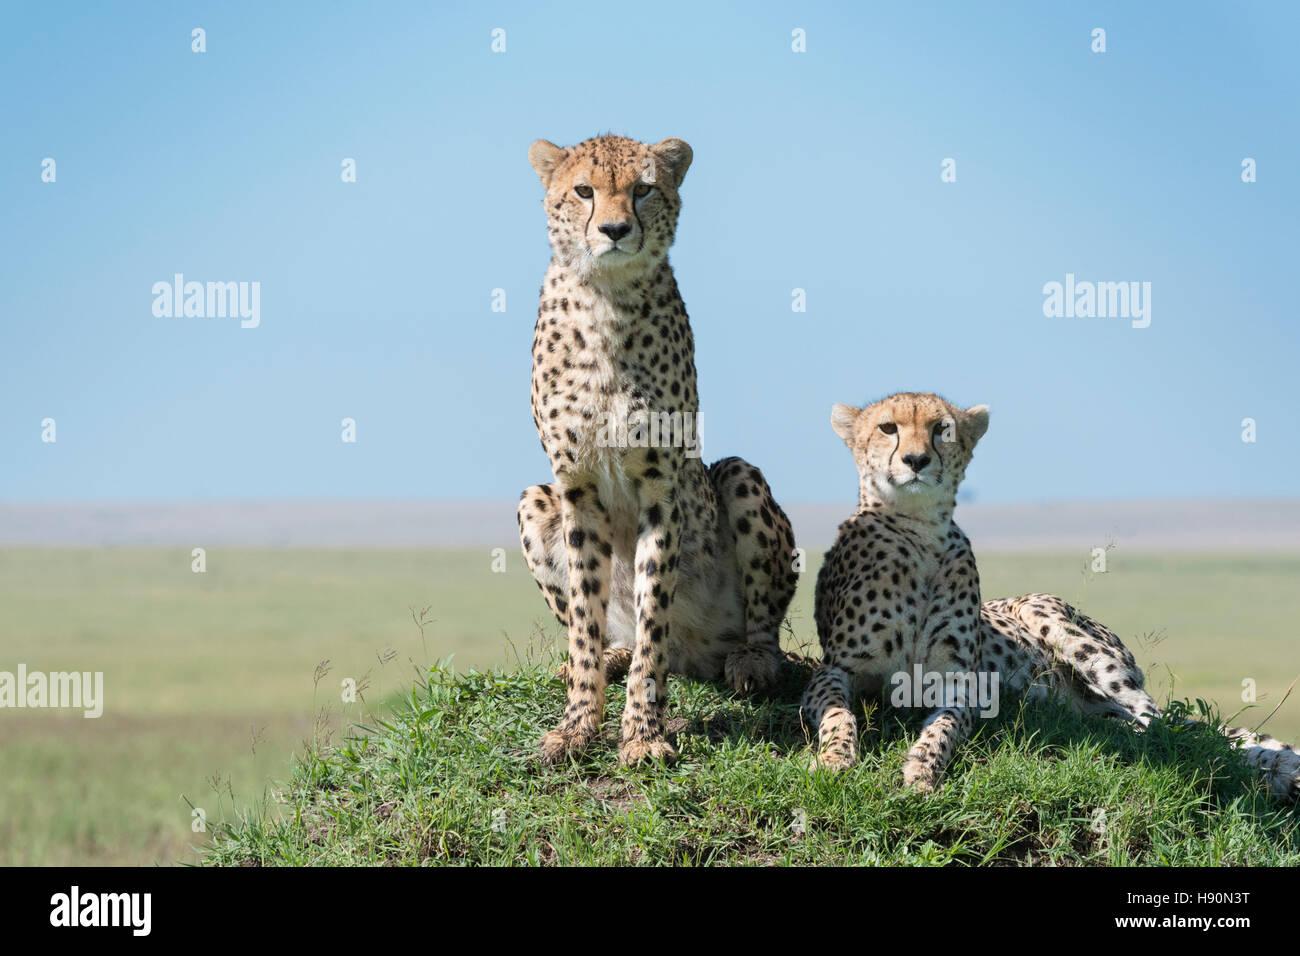 Cheetah (Acinonix jubatus) on hill in savanna, close up, Maasai Mara National Reserve, Kenya - Stock Image